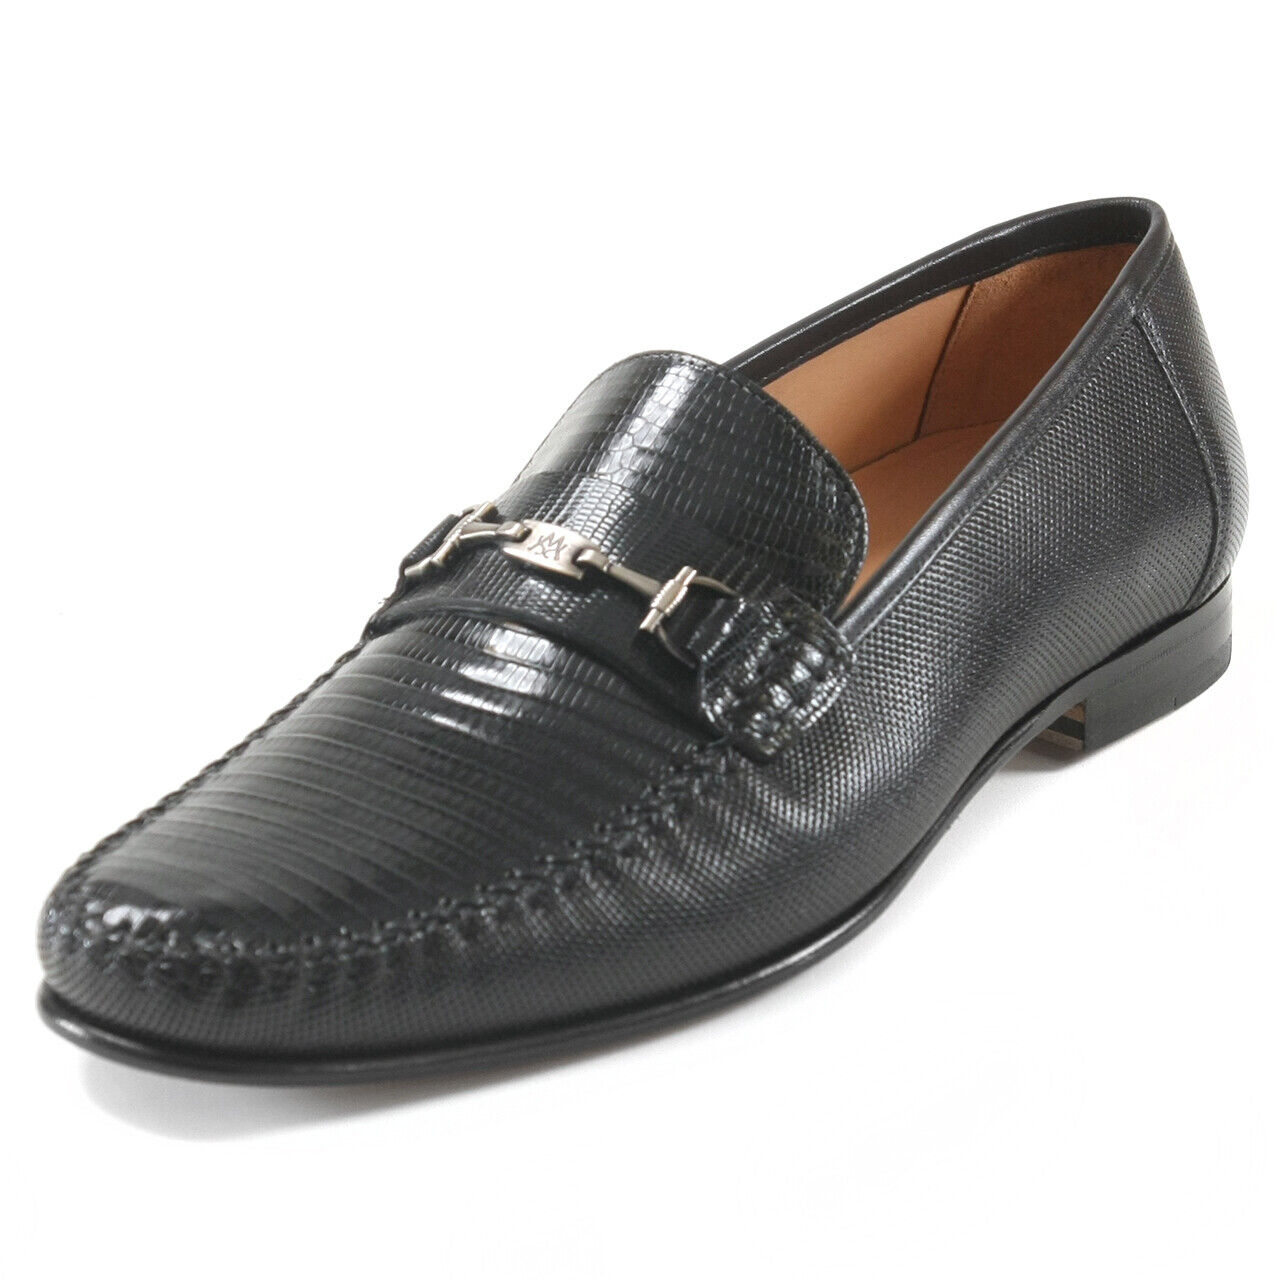 Mezlan Sileno Black Lizard & Leather Loafers